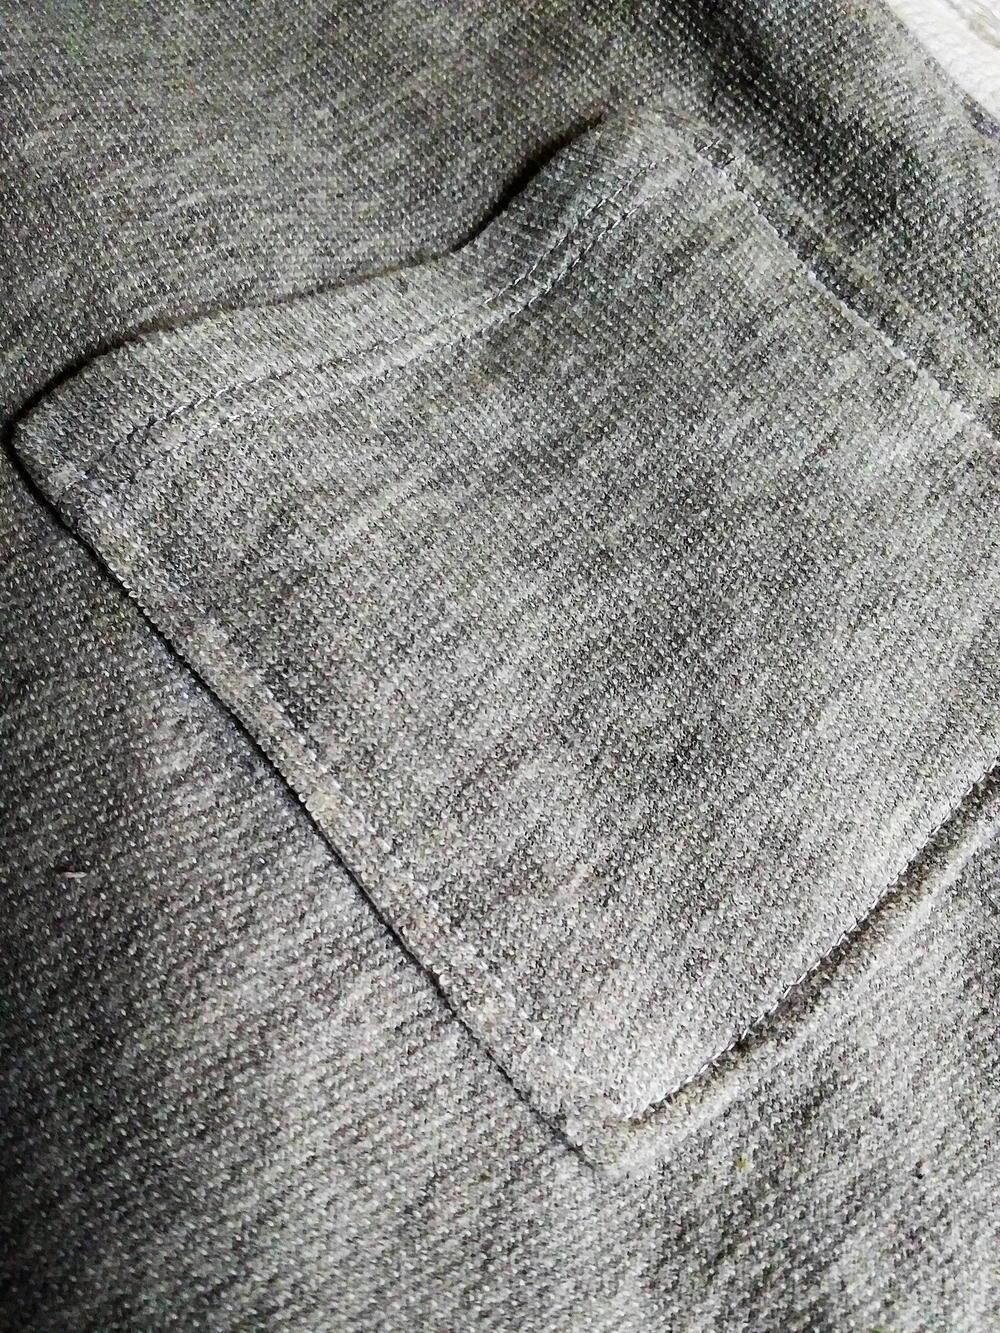 Simple Winter Diy Sweatshirt Into Kids Hooded Bathrobe Favecrafts Com